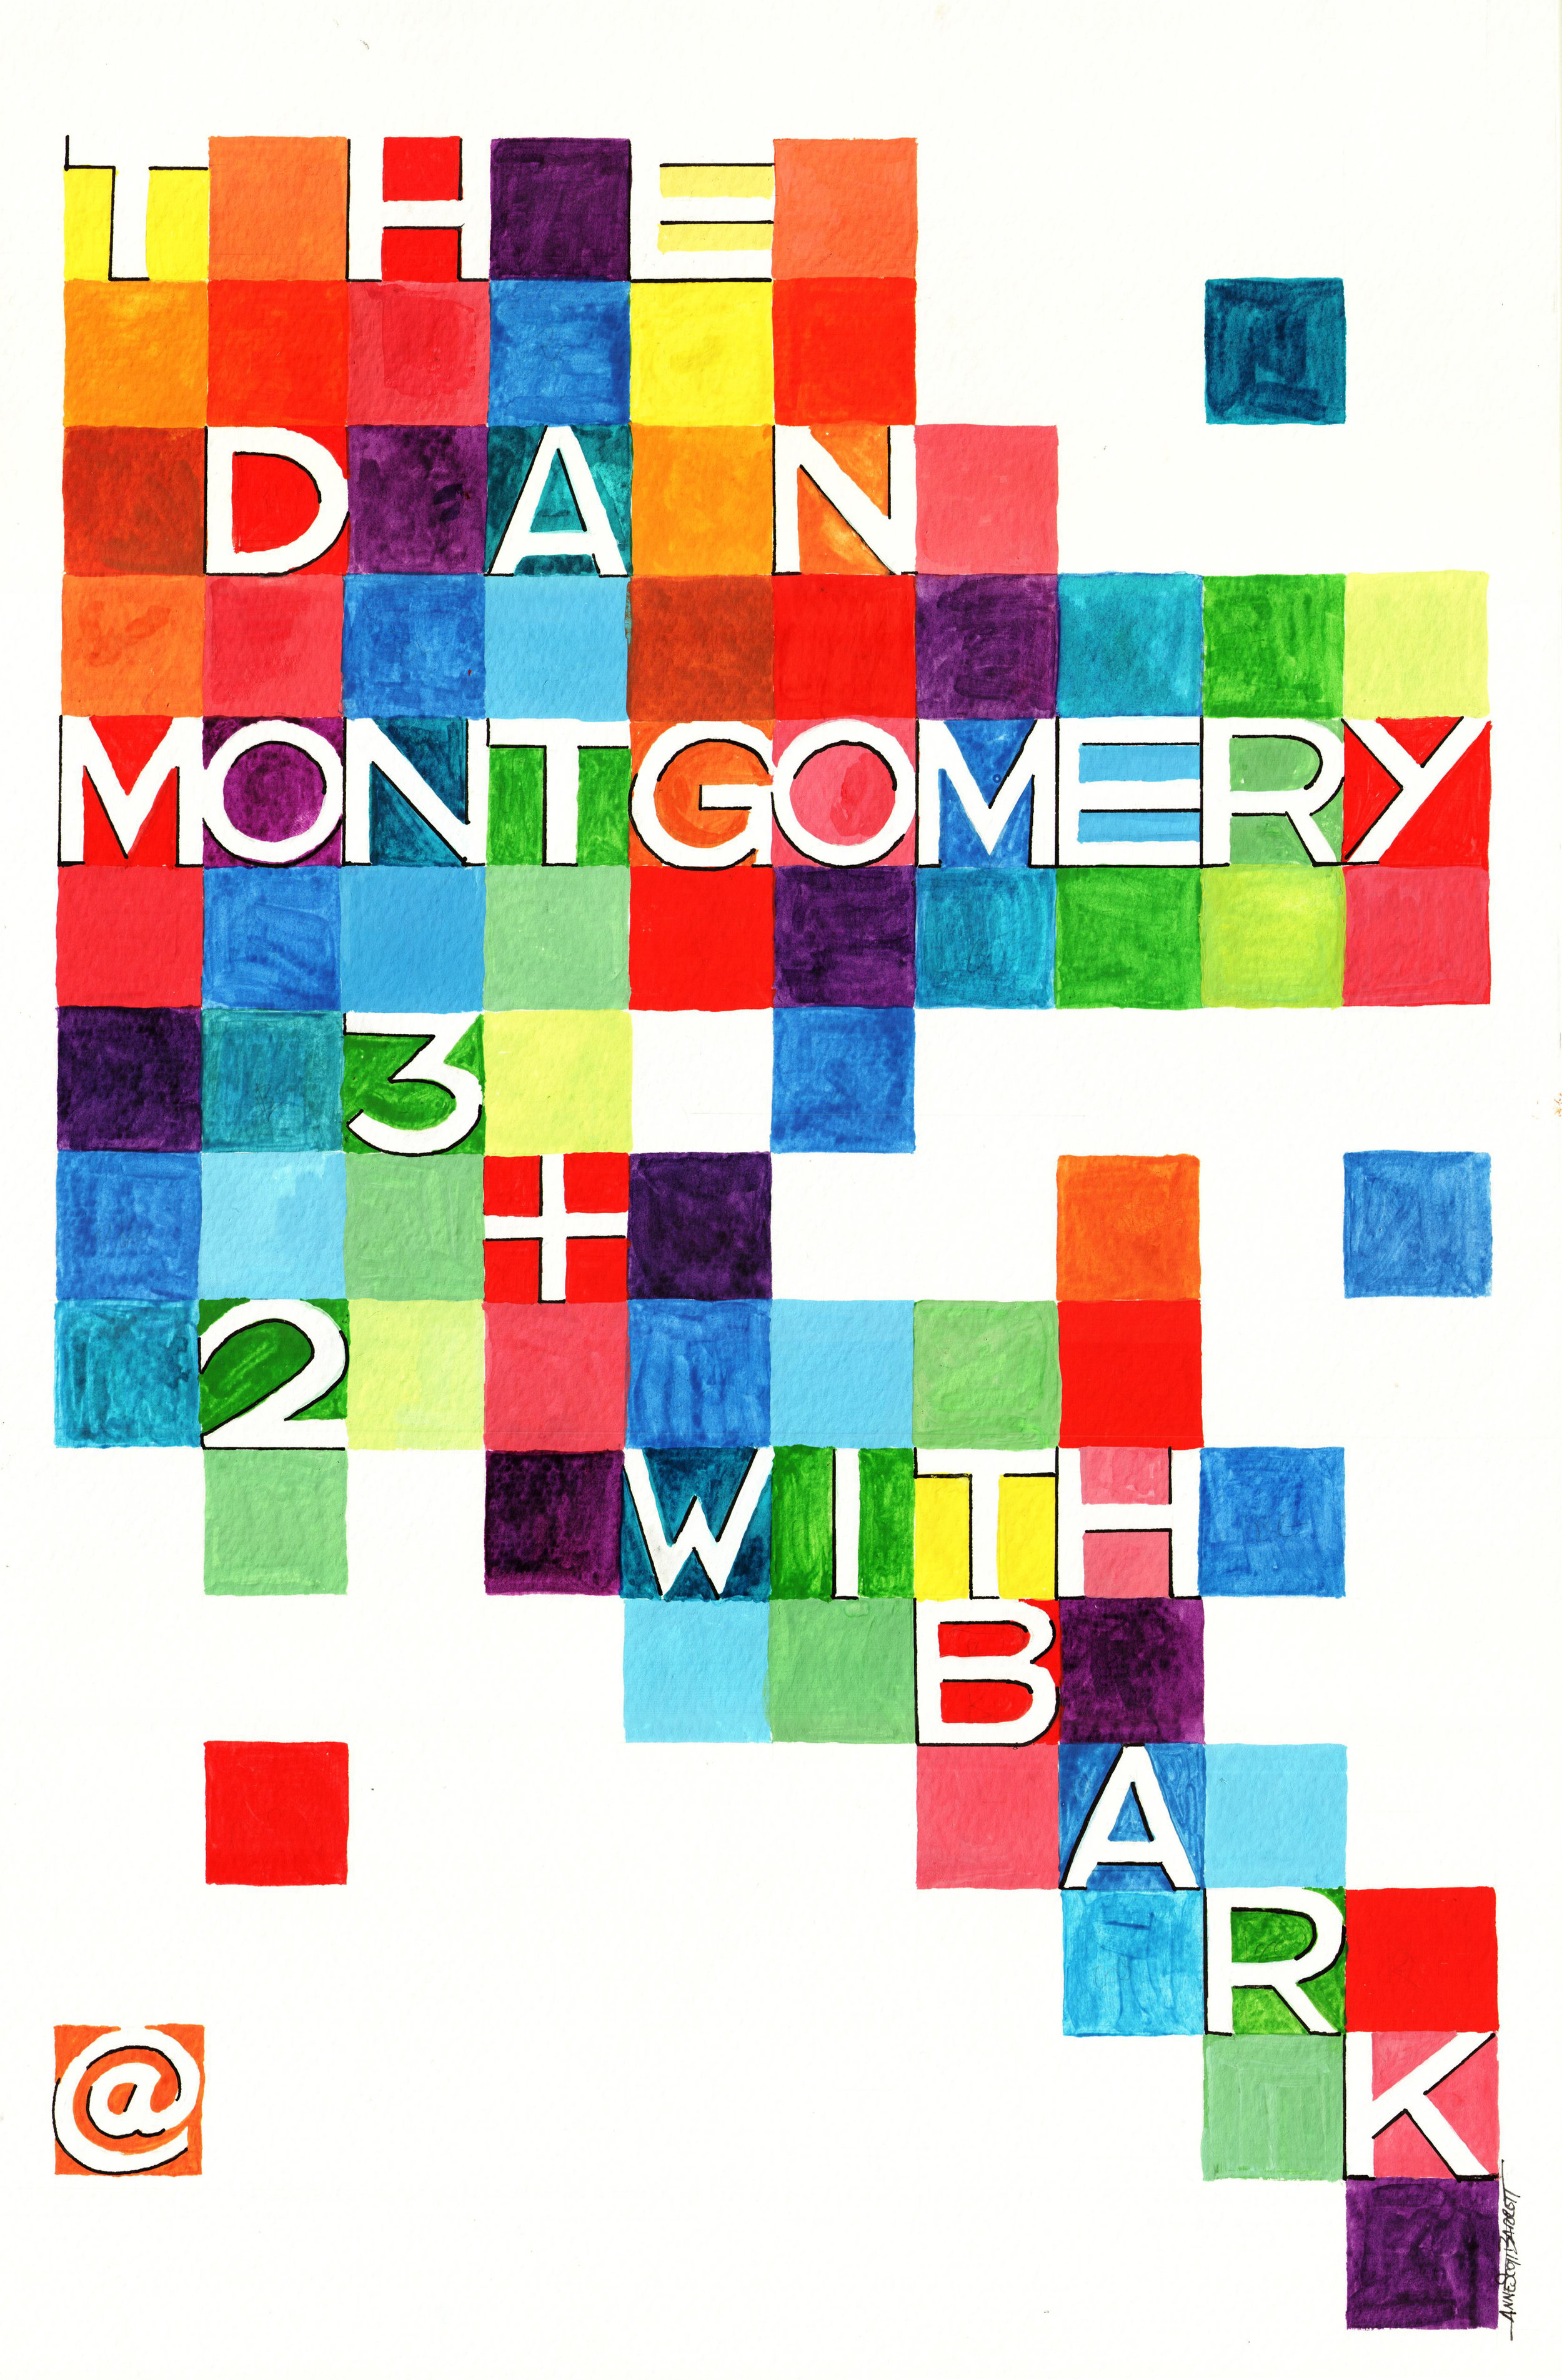 DanMontgomeryScan (1).jpg